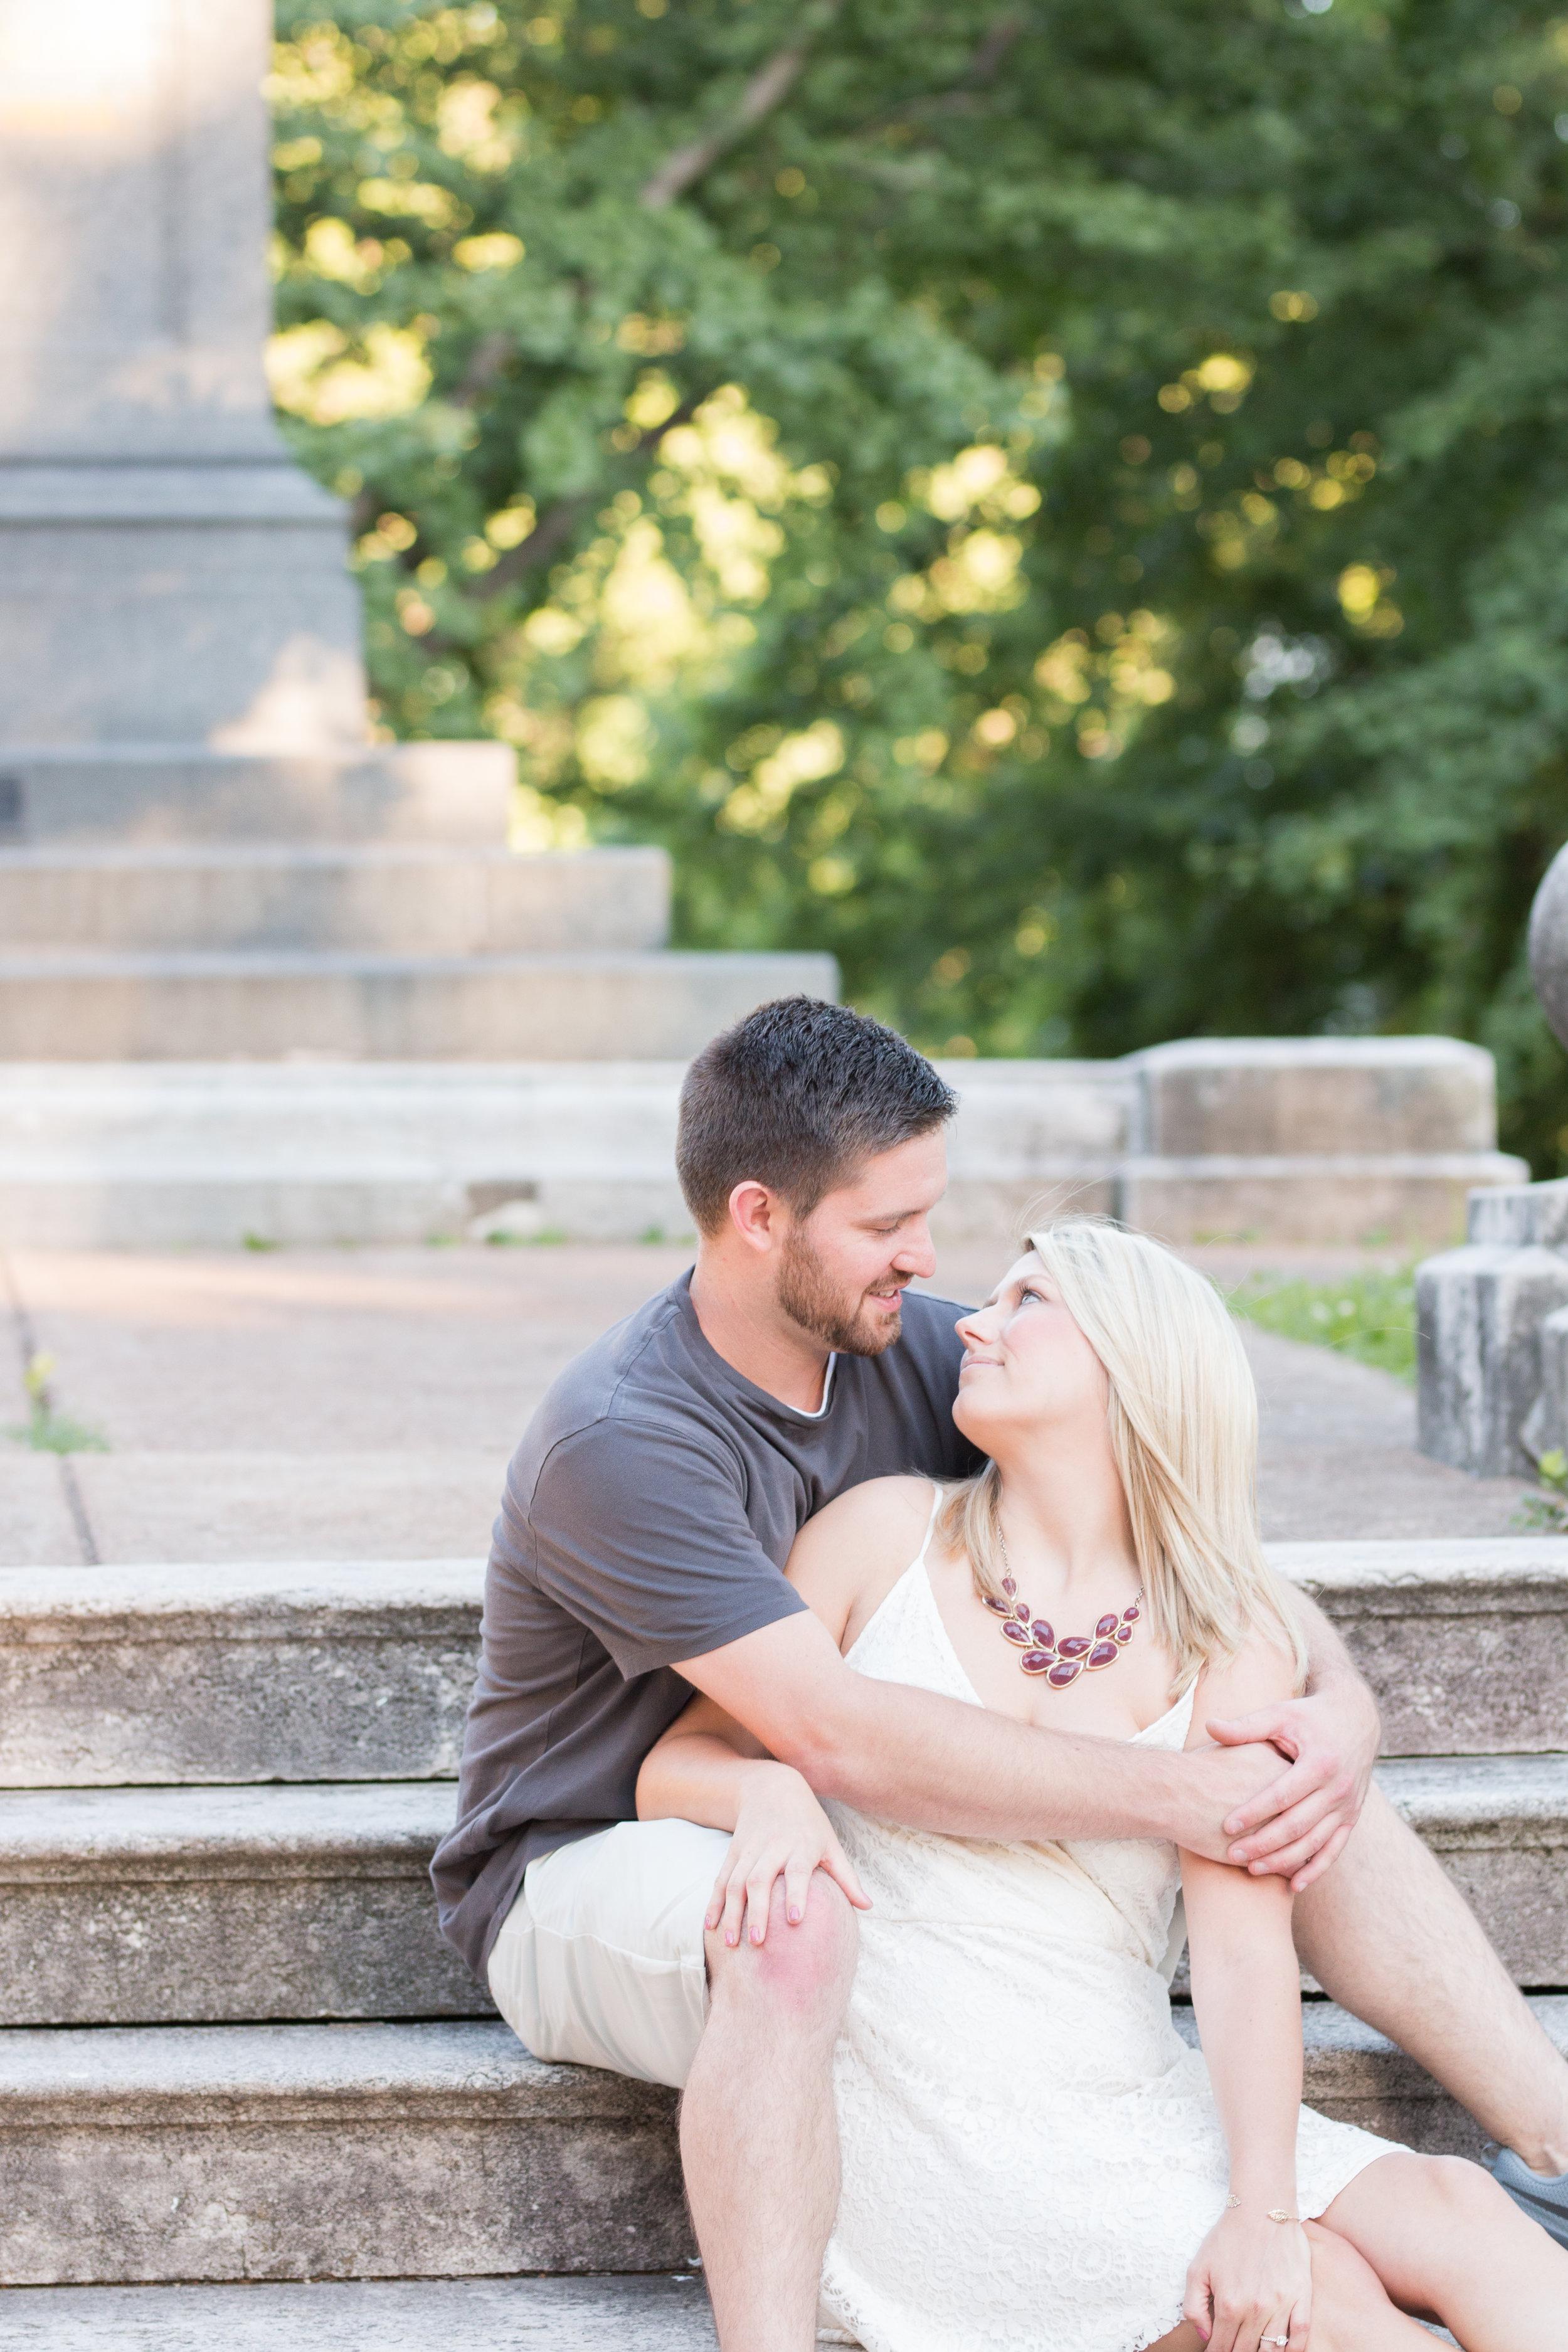 Kurtis & Jessica_Engagement_746 - 20170624-19.jpg